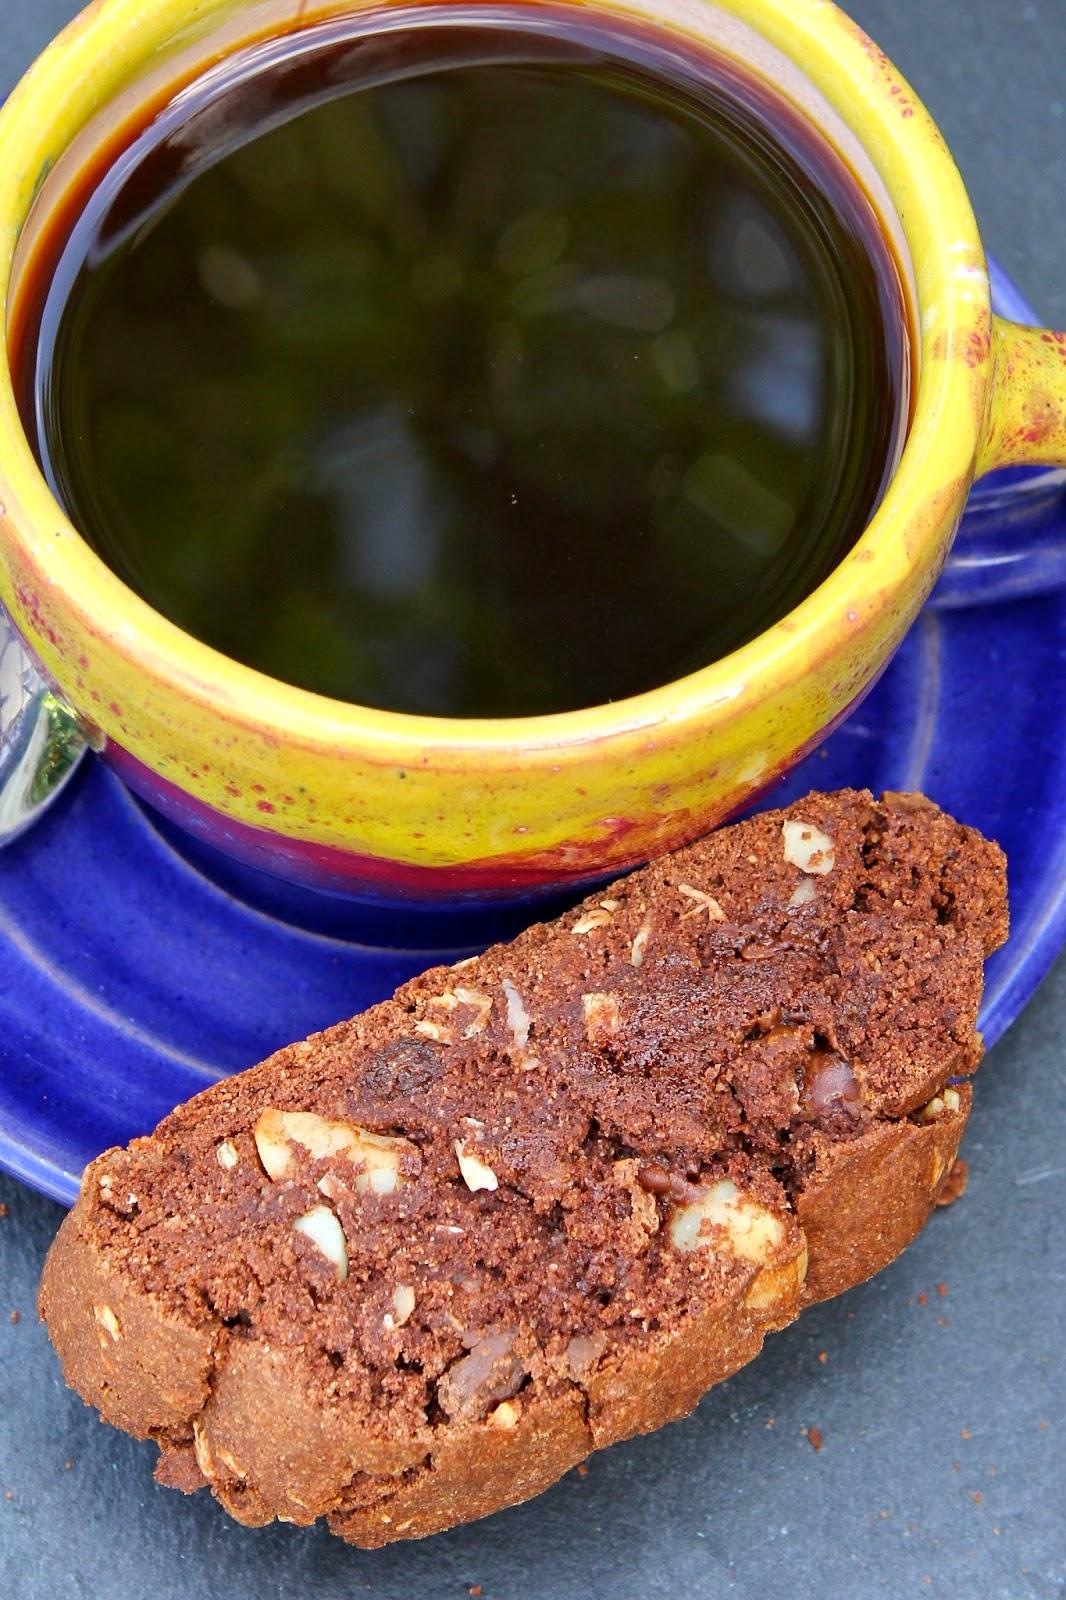 Double Chocolate, Coconut & Macadamia Biscotti (gluten free)